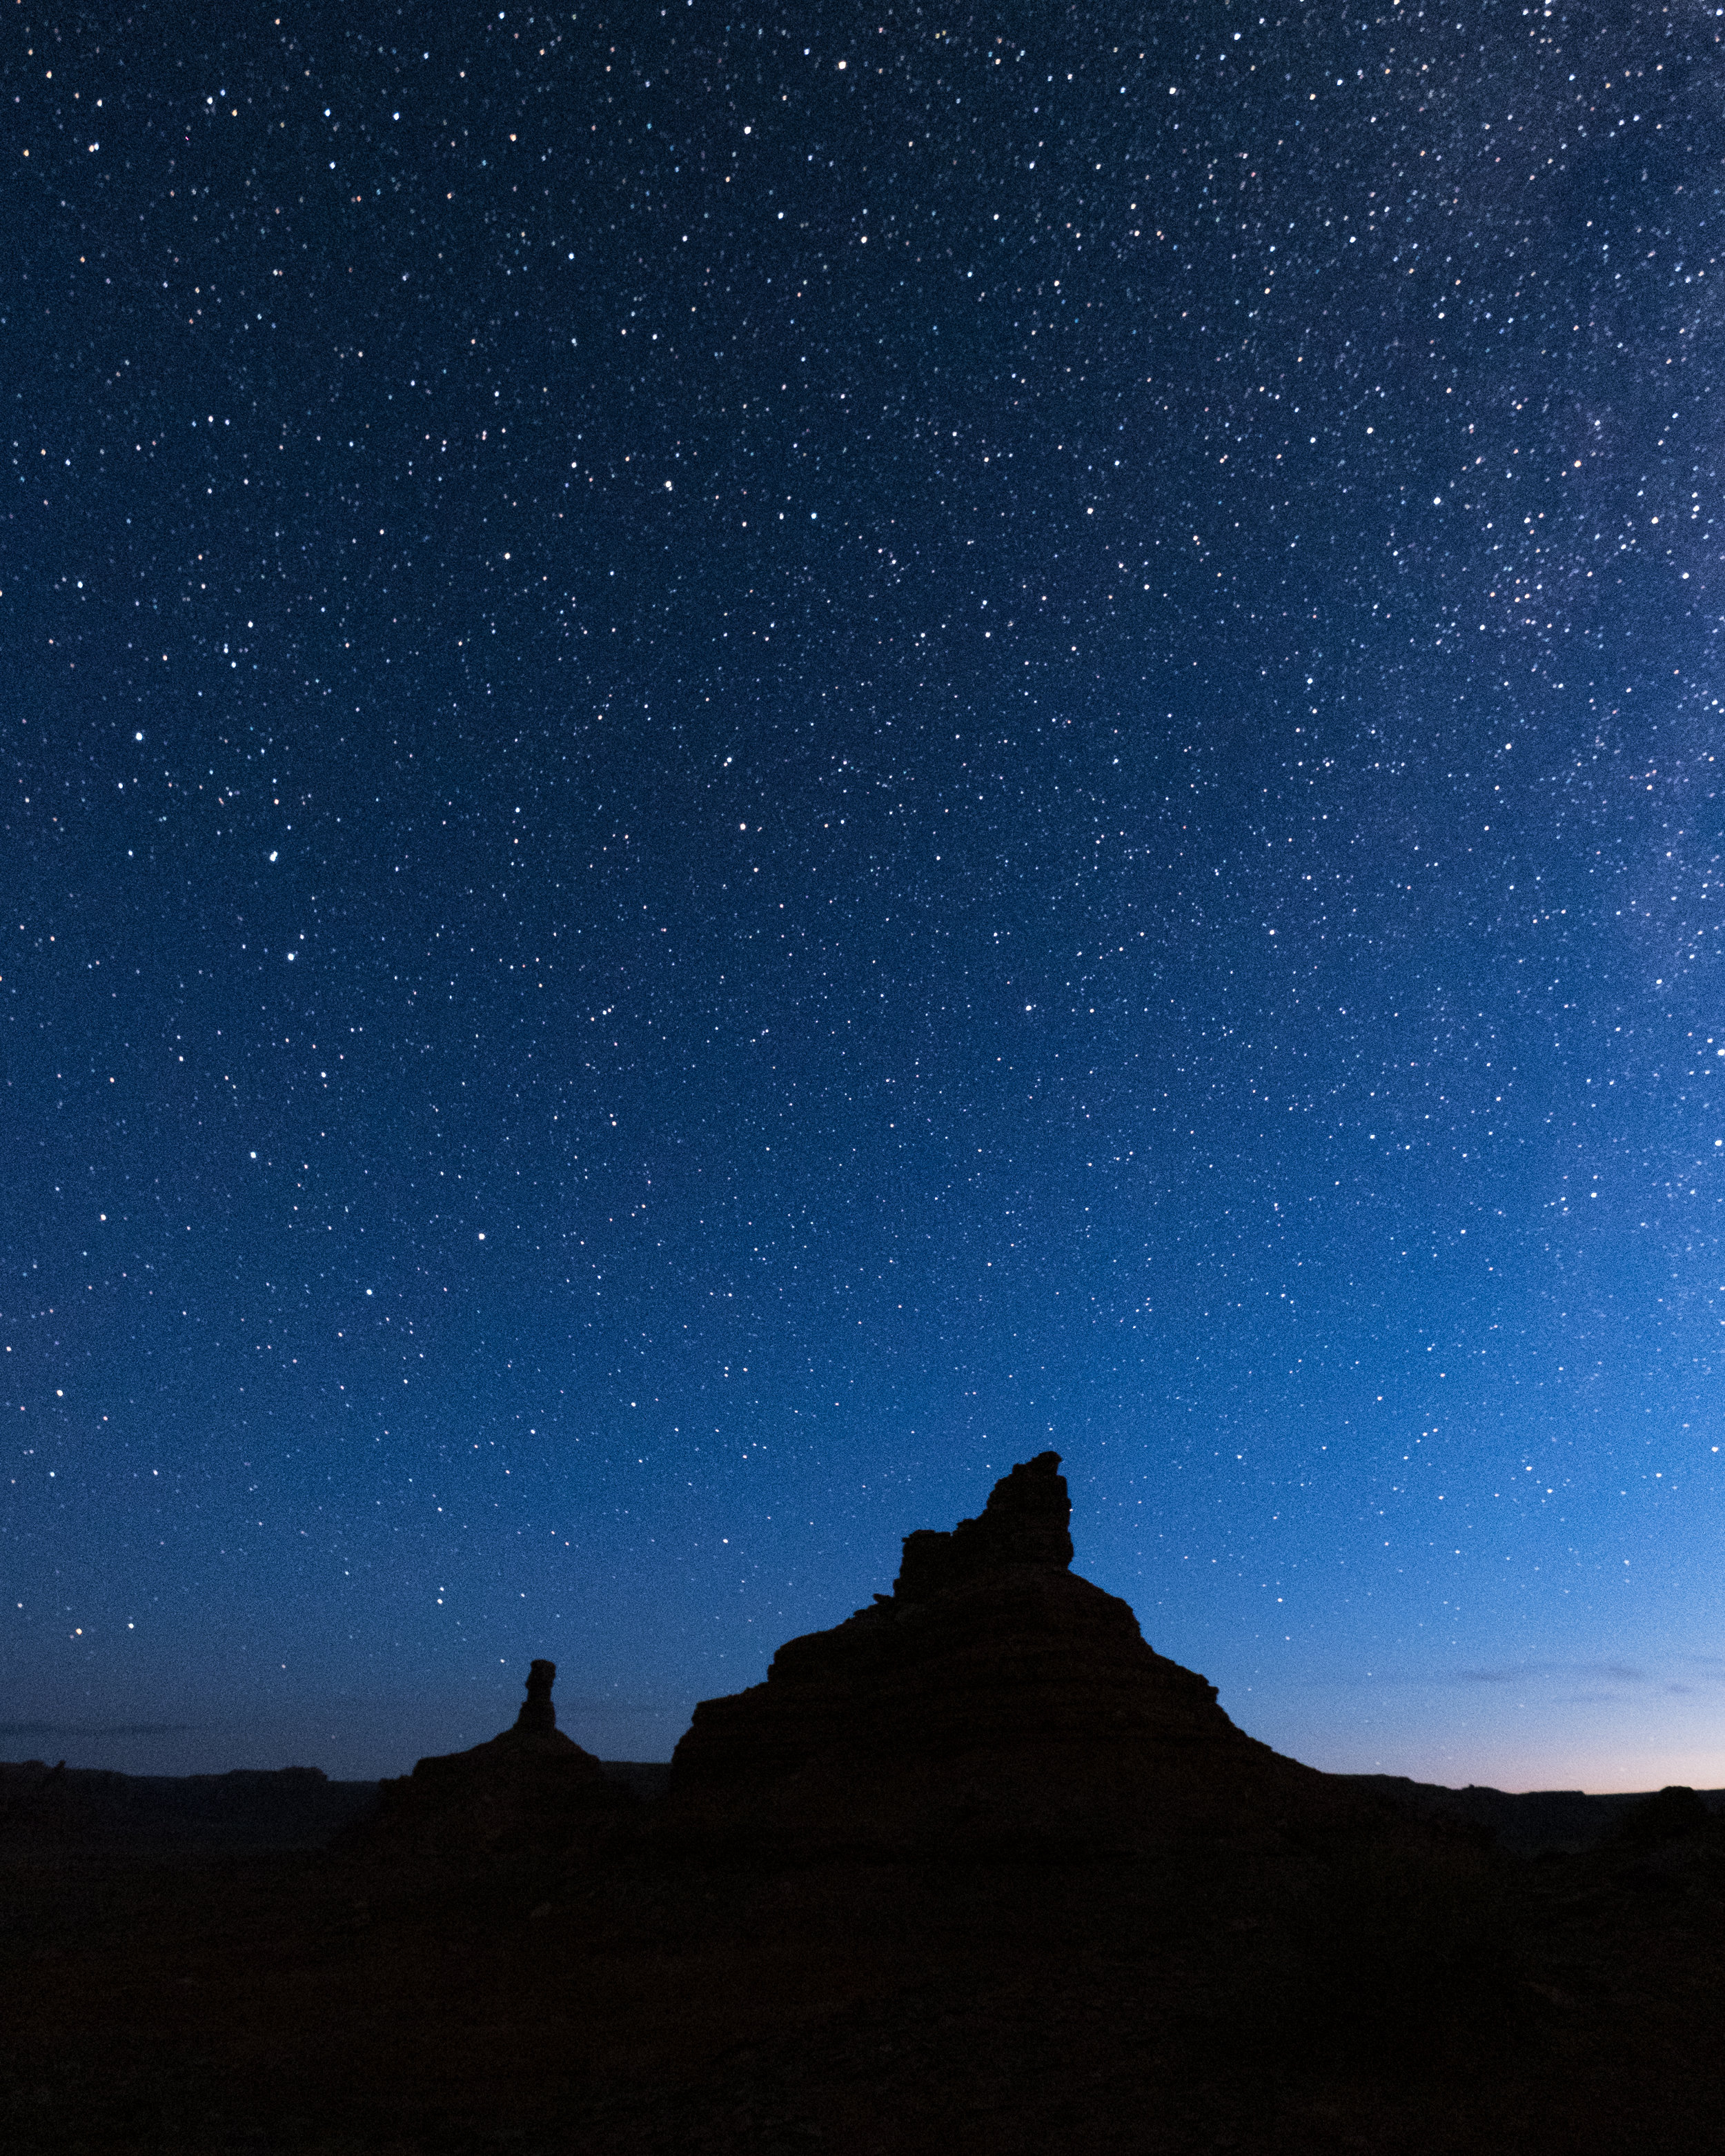 I woke up early to get a shot of Utah's night sky.